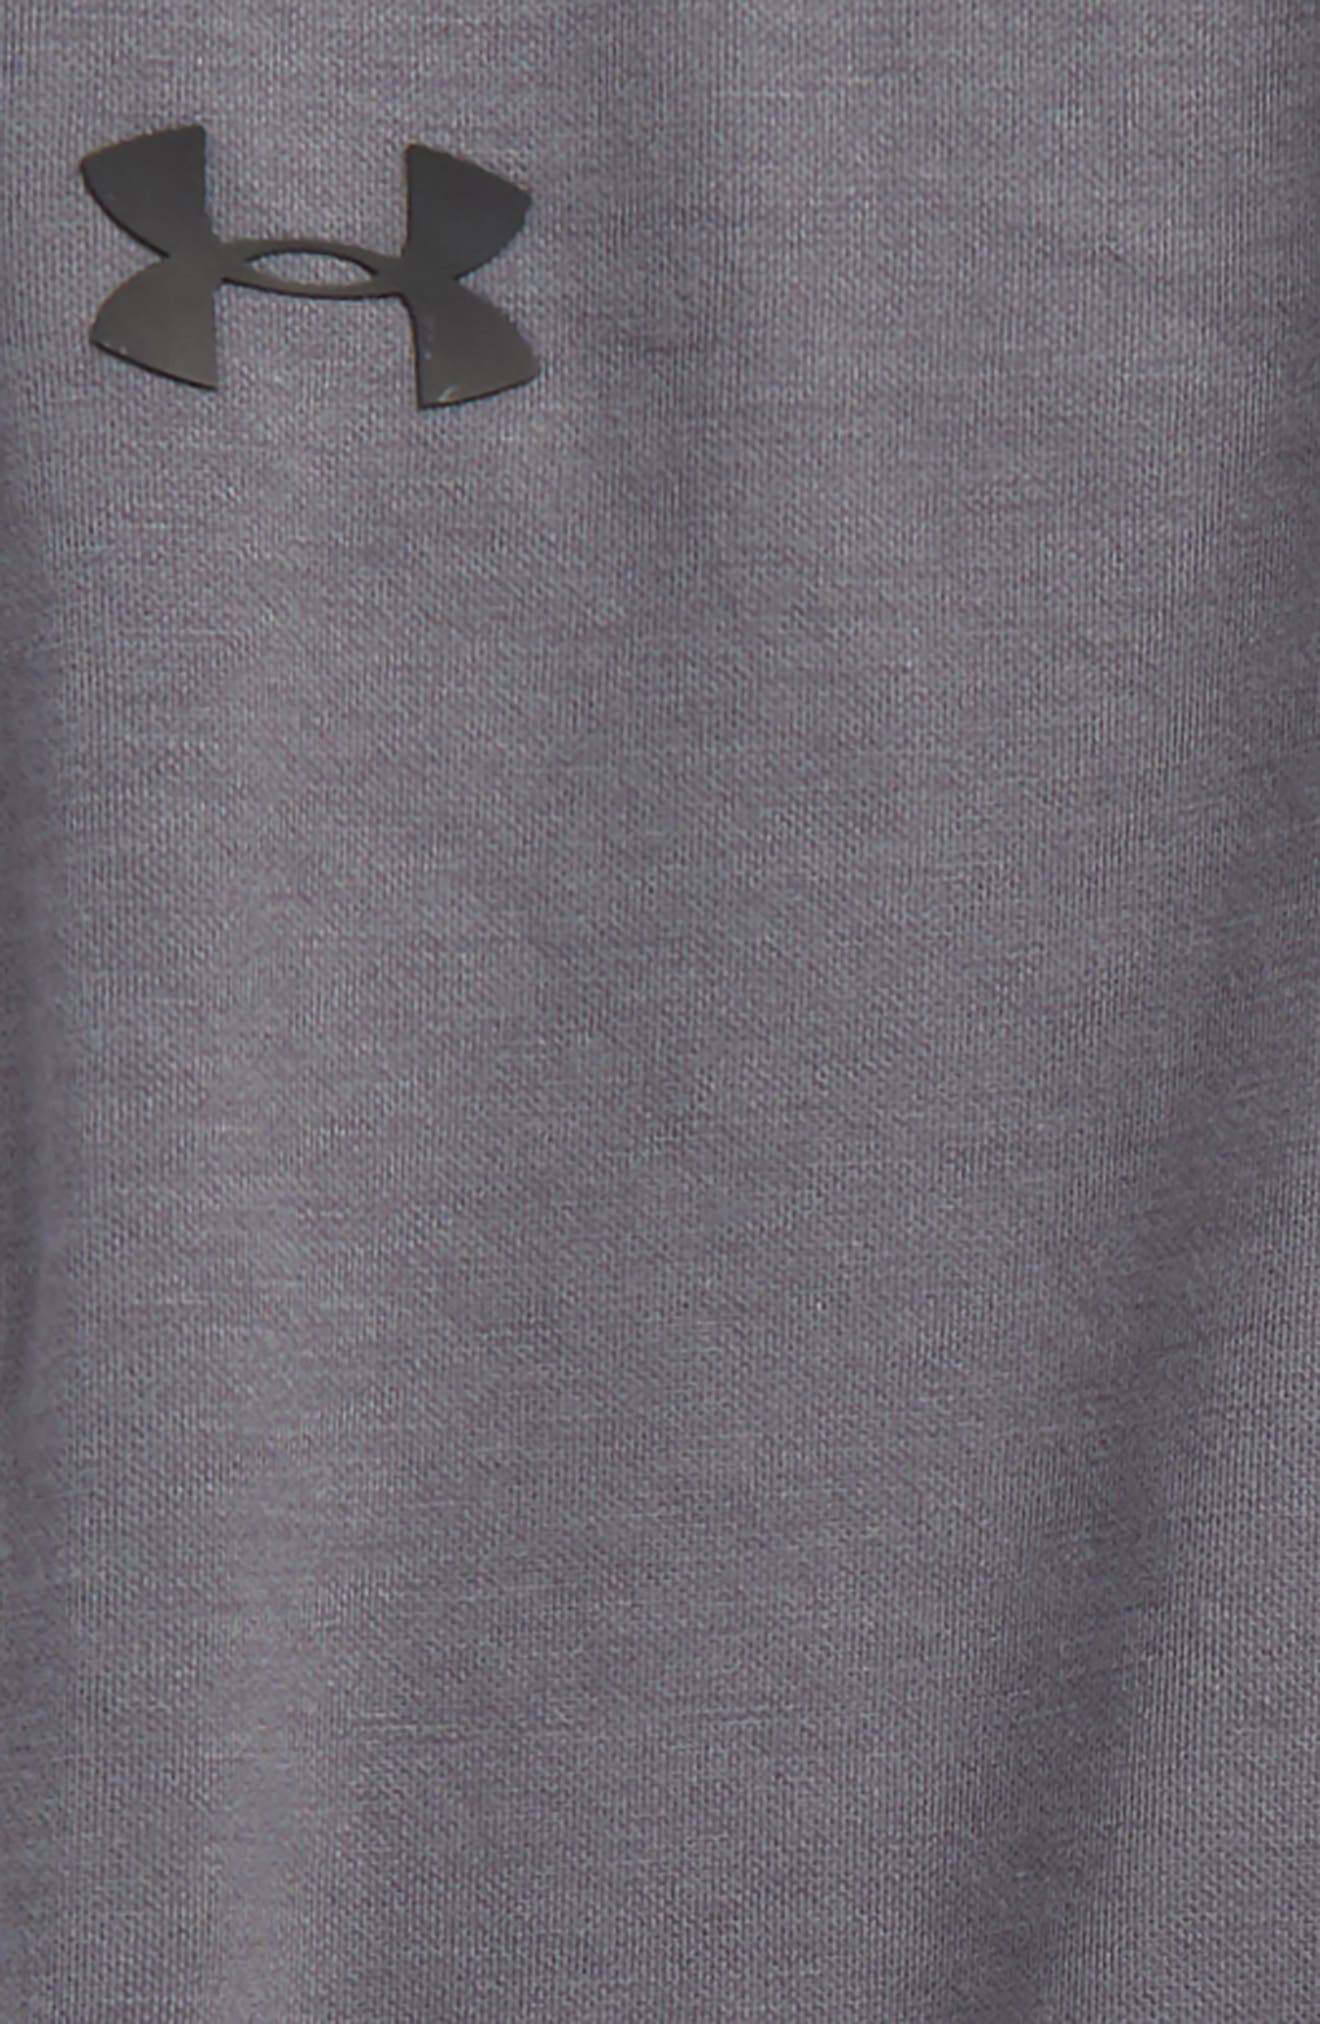 Threadborne Tech Sweatpants,                             Alternate thumbnail 3, color,                             Graphite/ Black